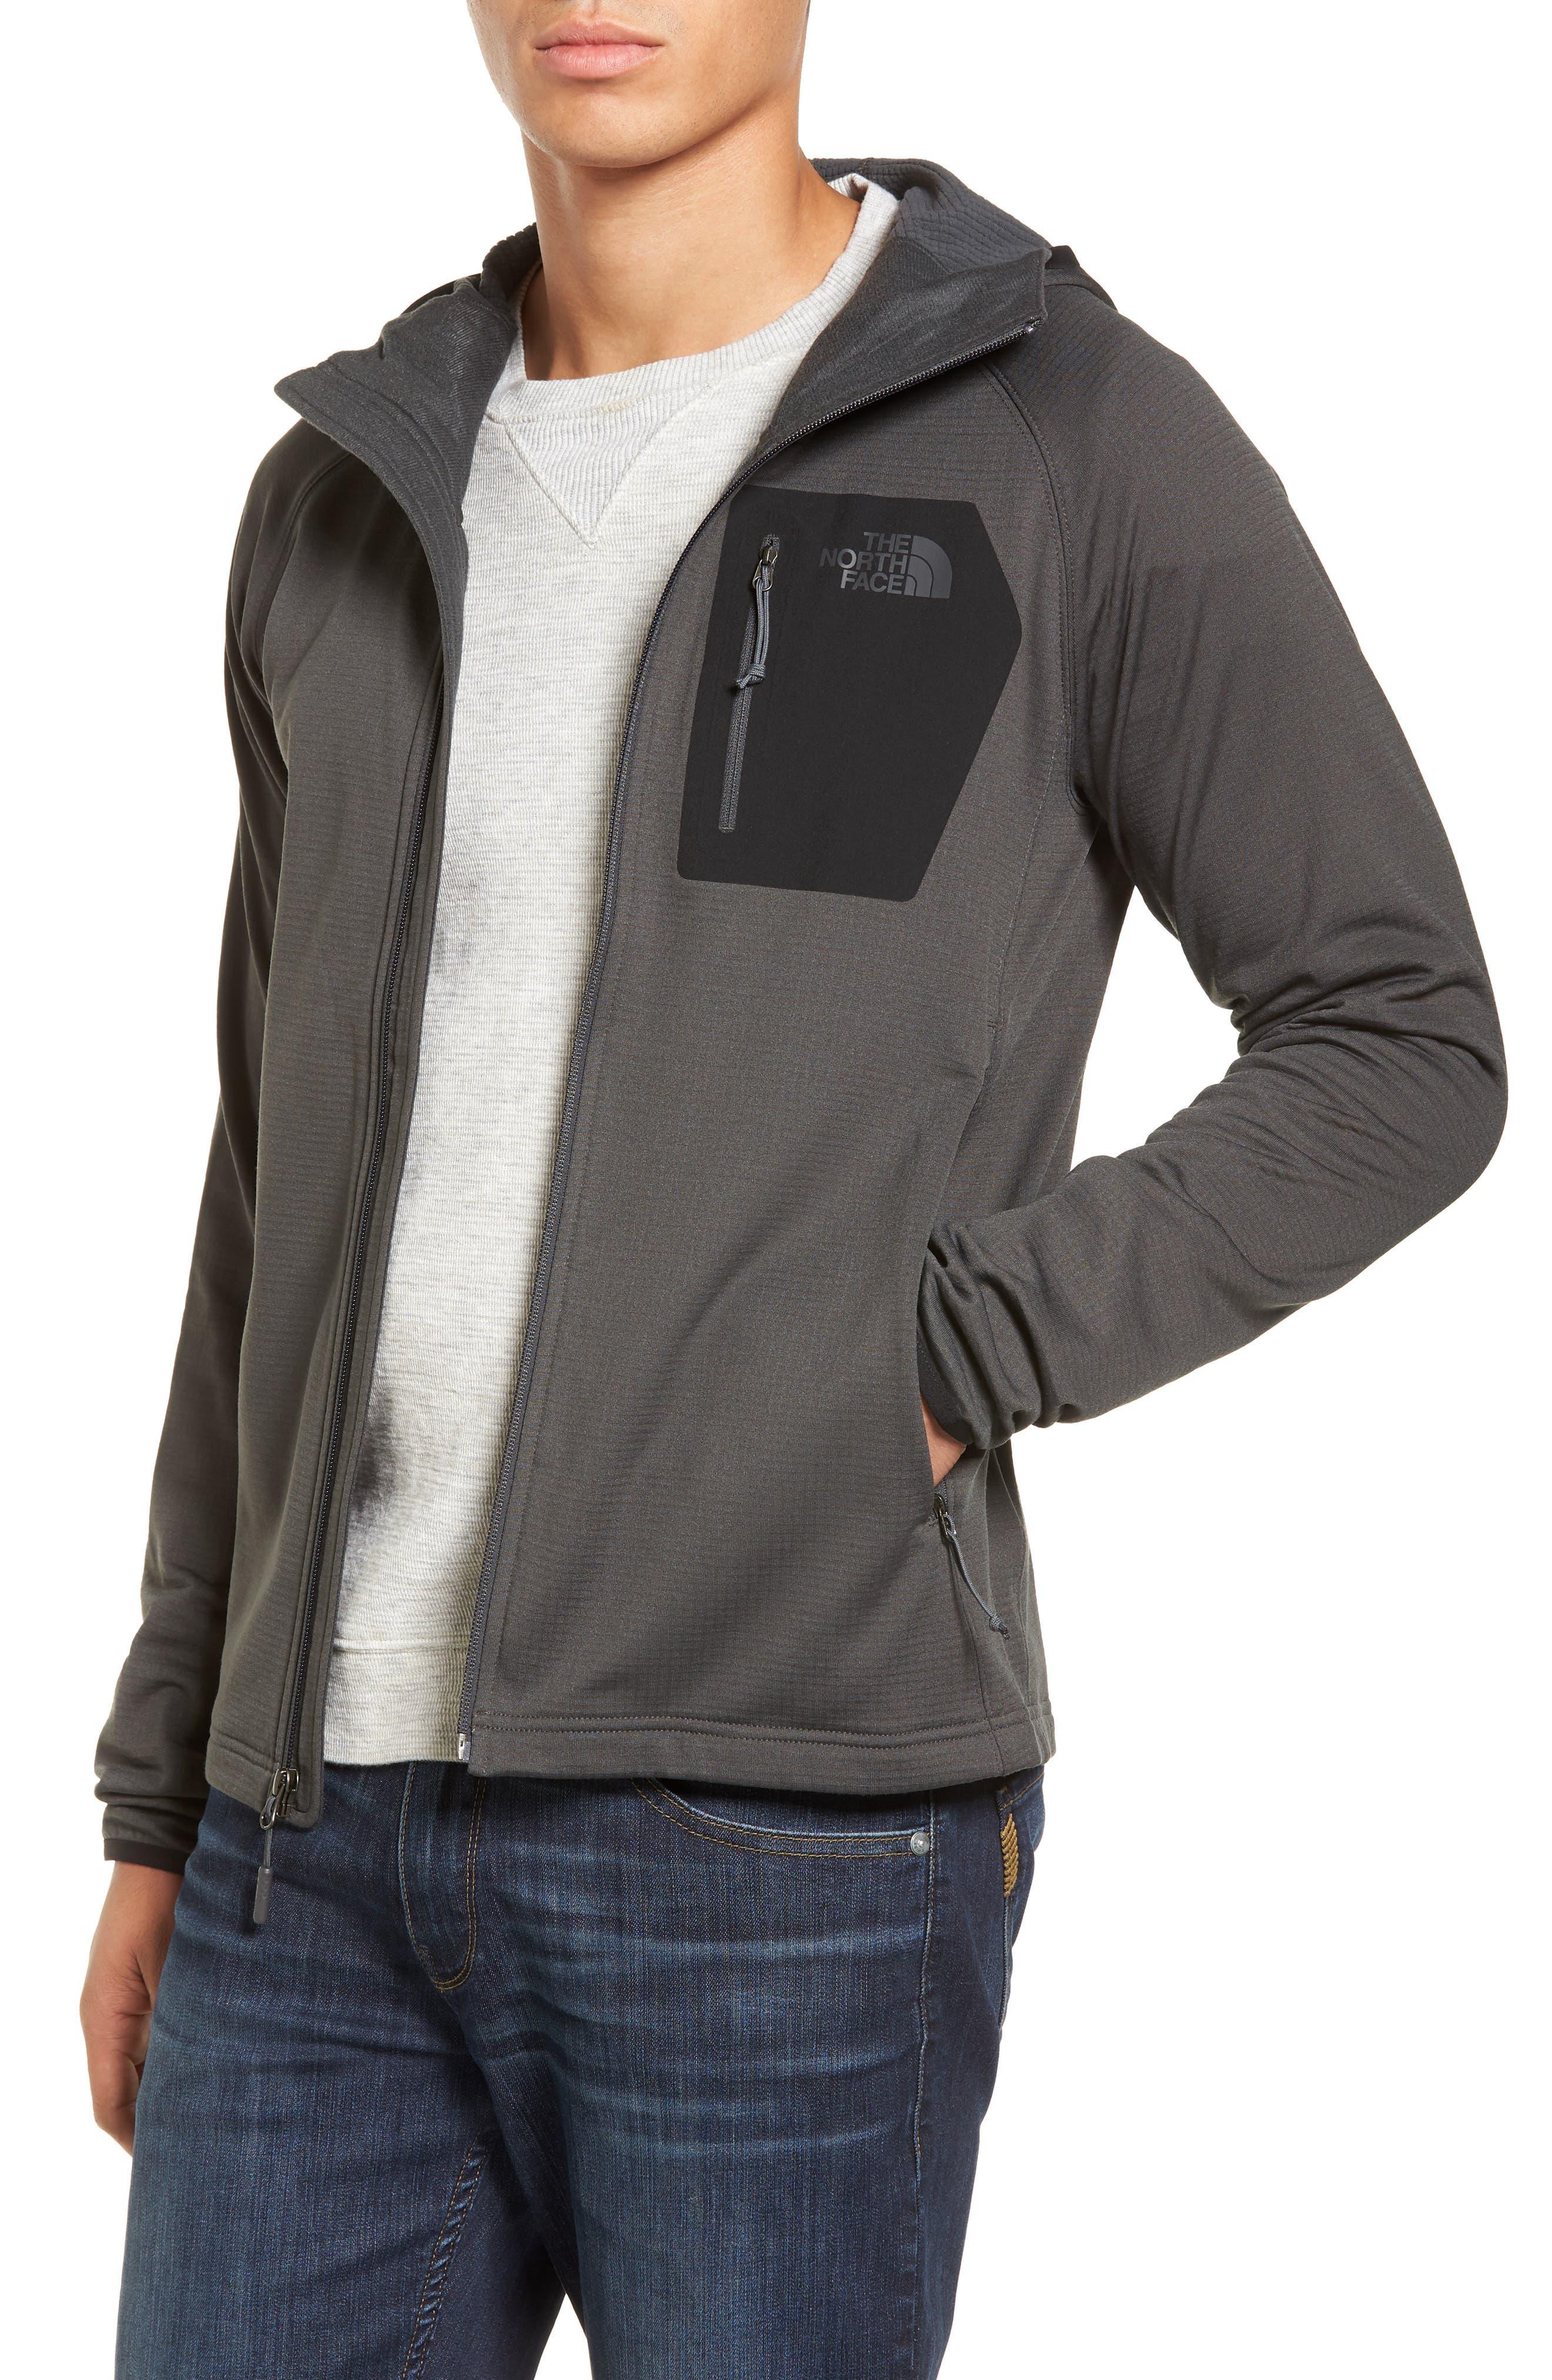 Alternate Image 1 Selected - The North Face Borod Zip Fleece Jacket